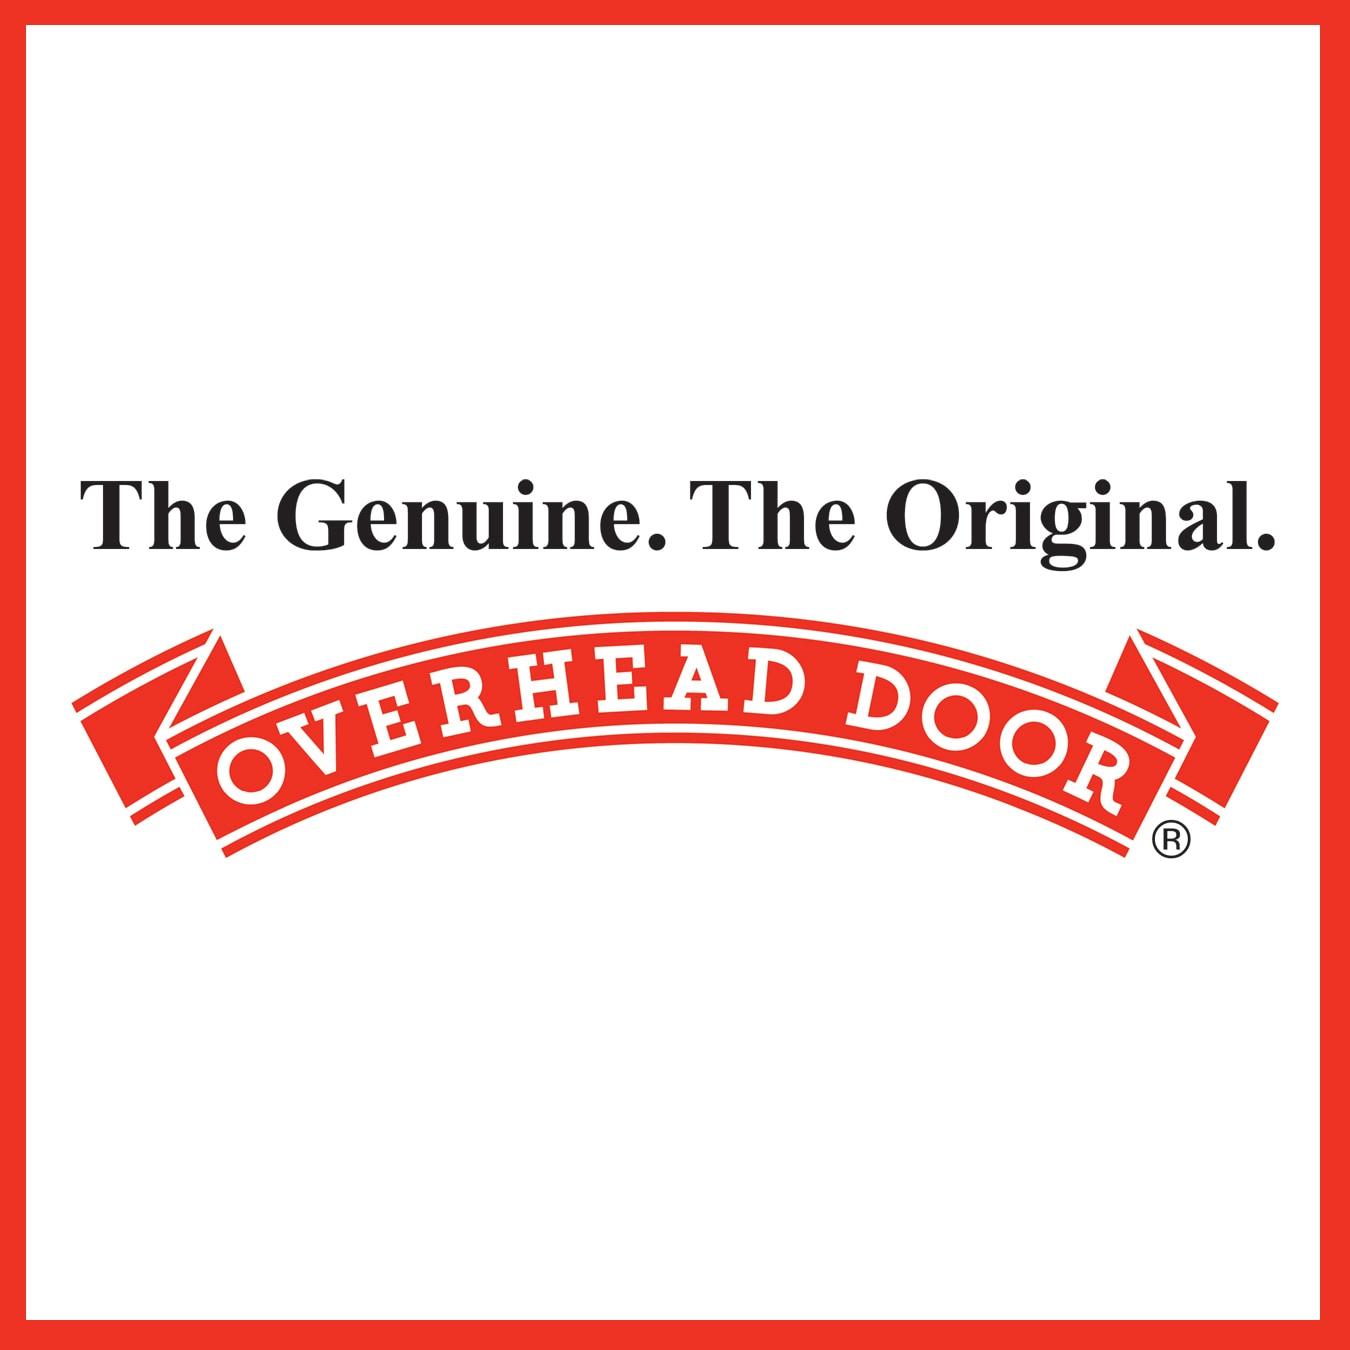 Overhead Door Co of Washington DC logo